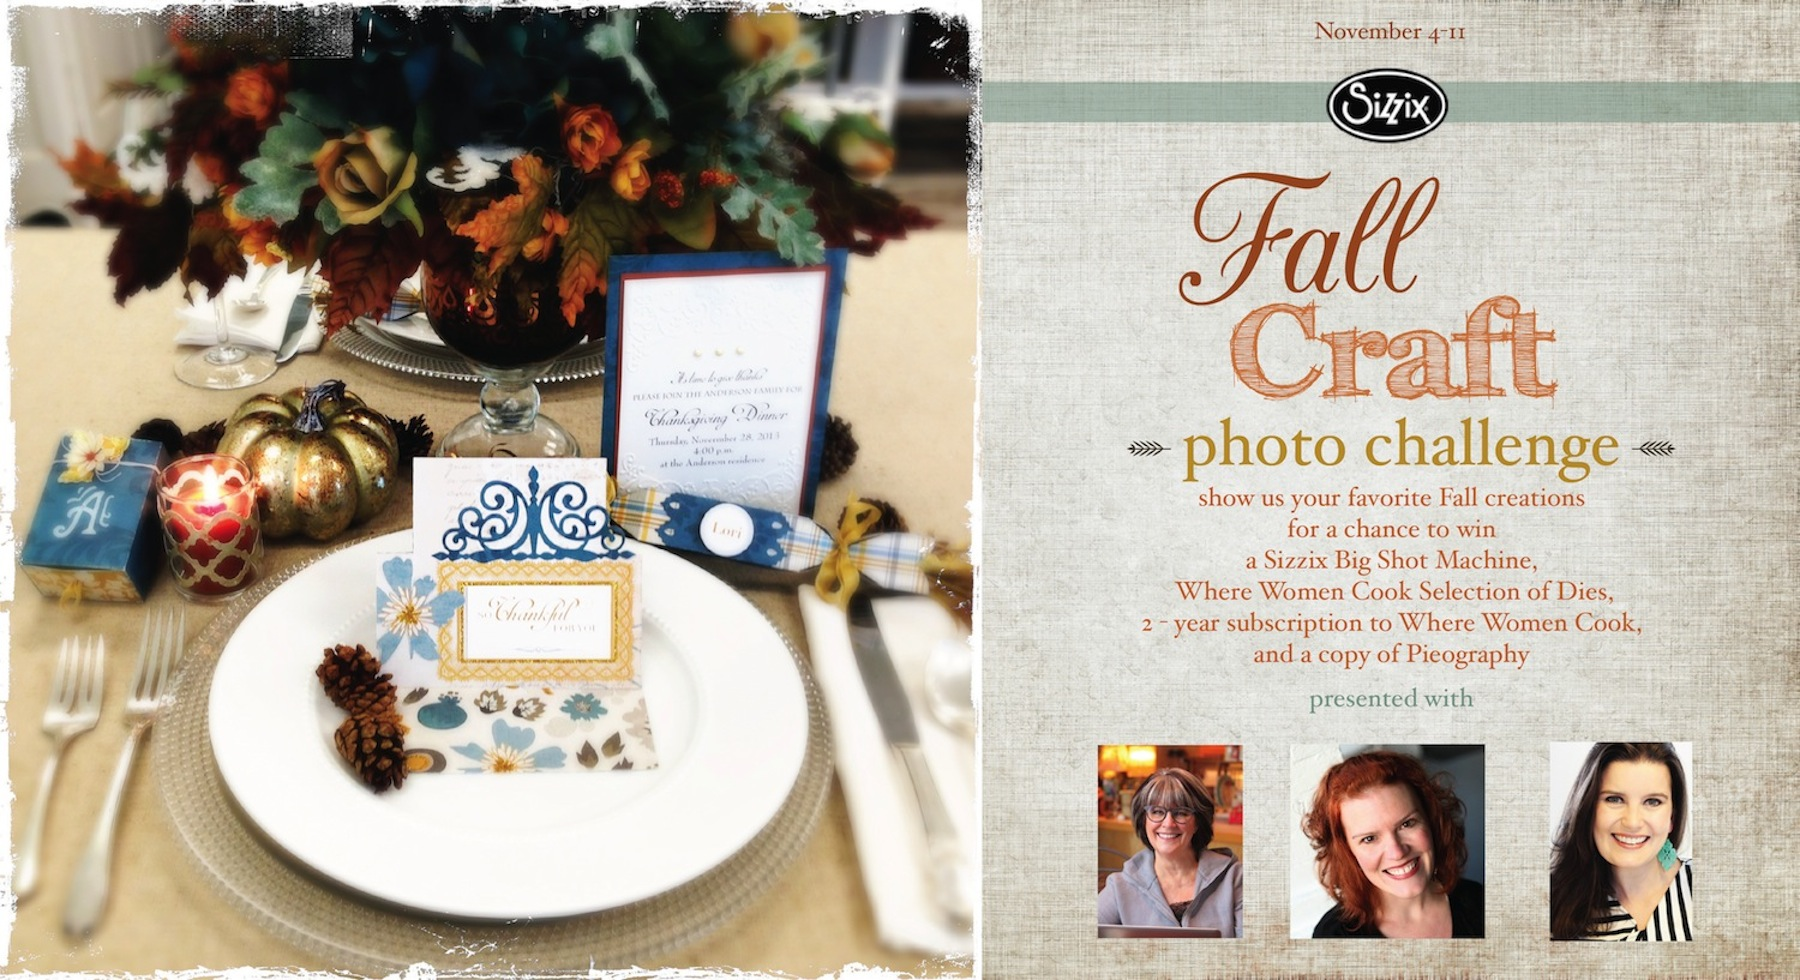 Fall Craft Photo Challenge